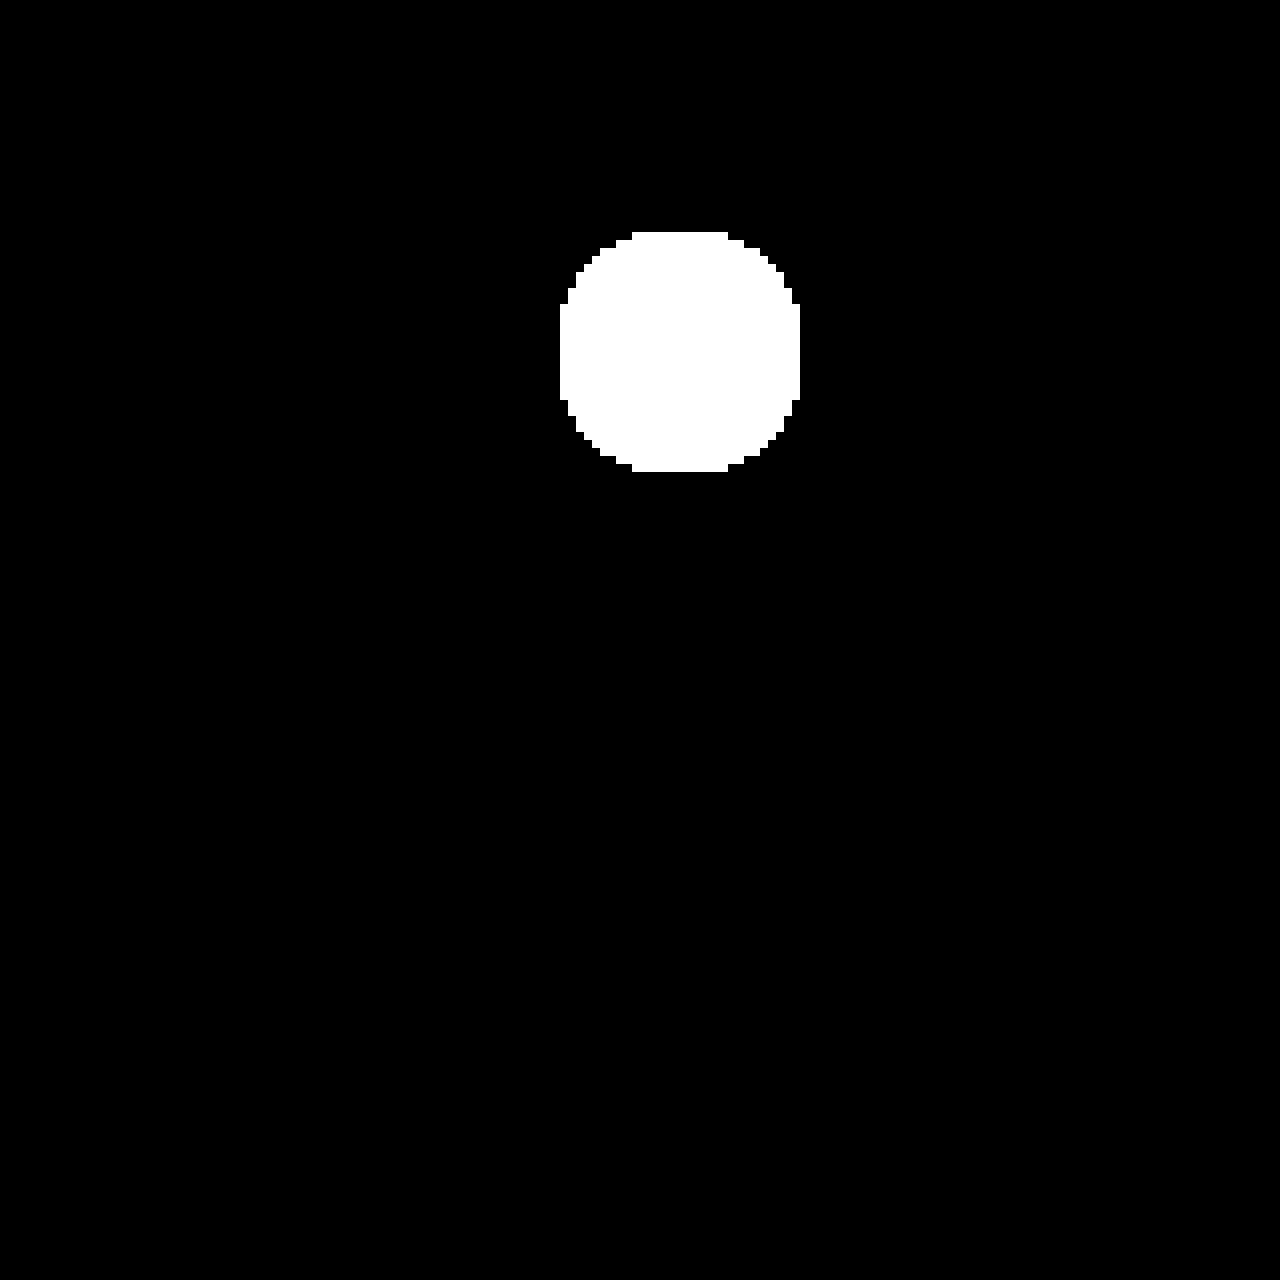 Circle (model)